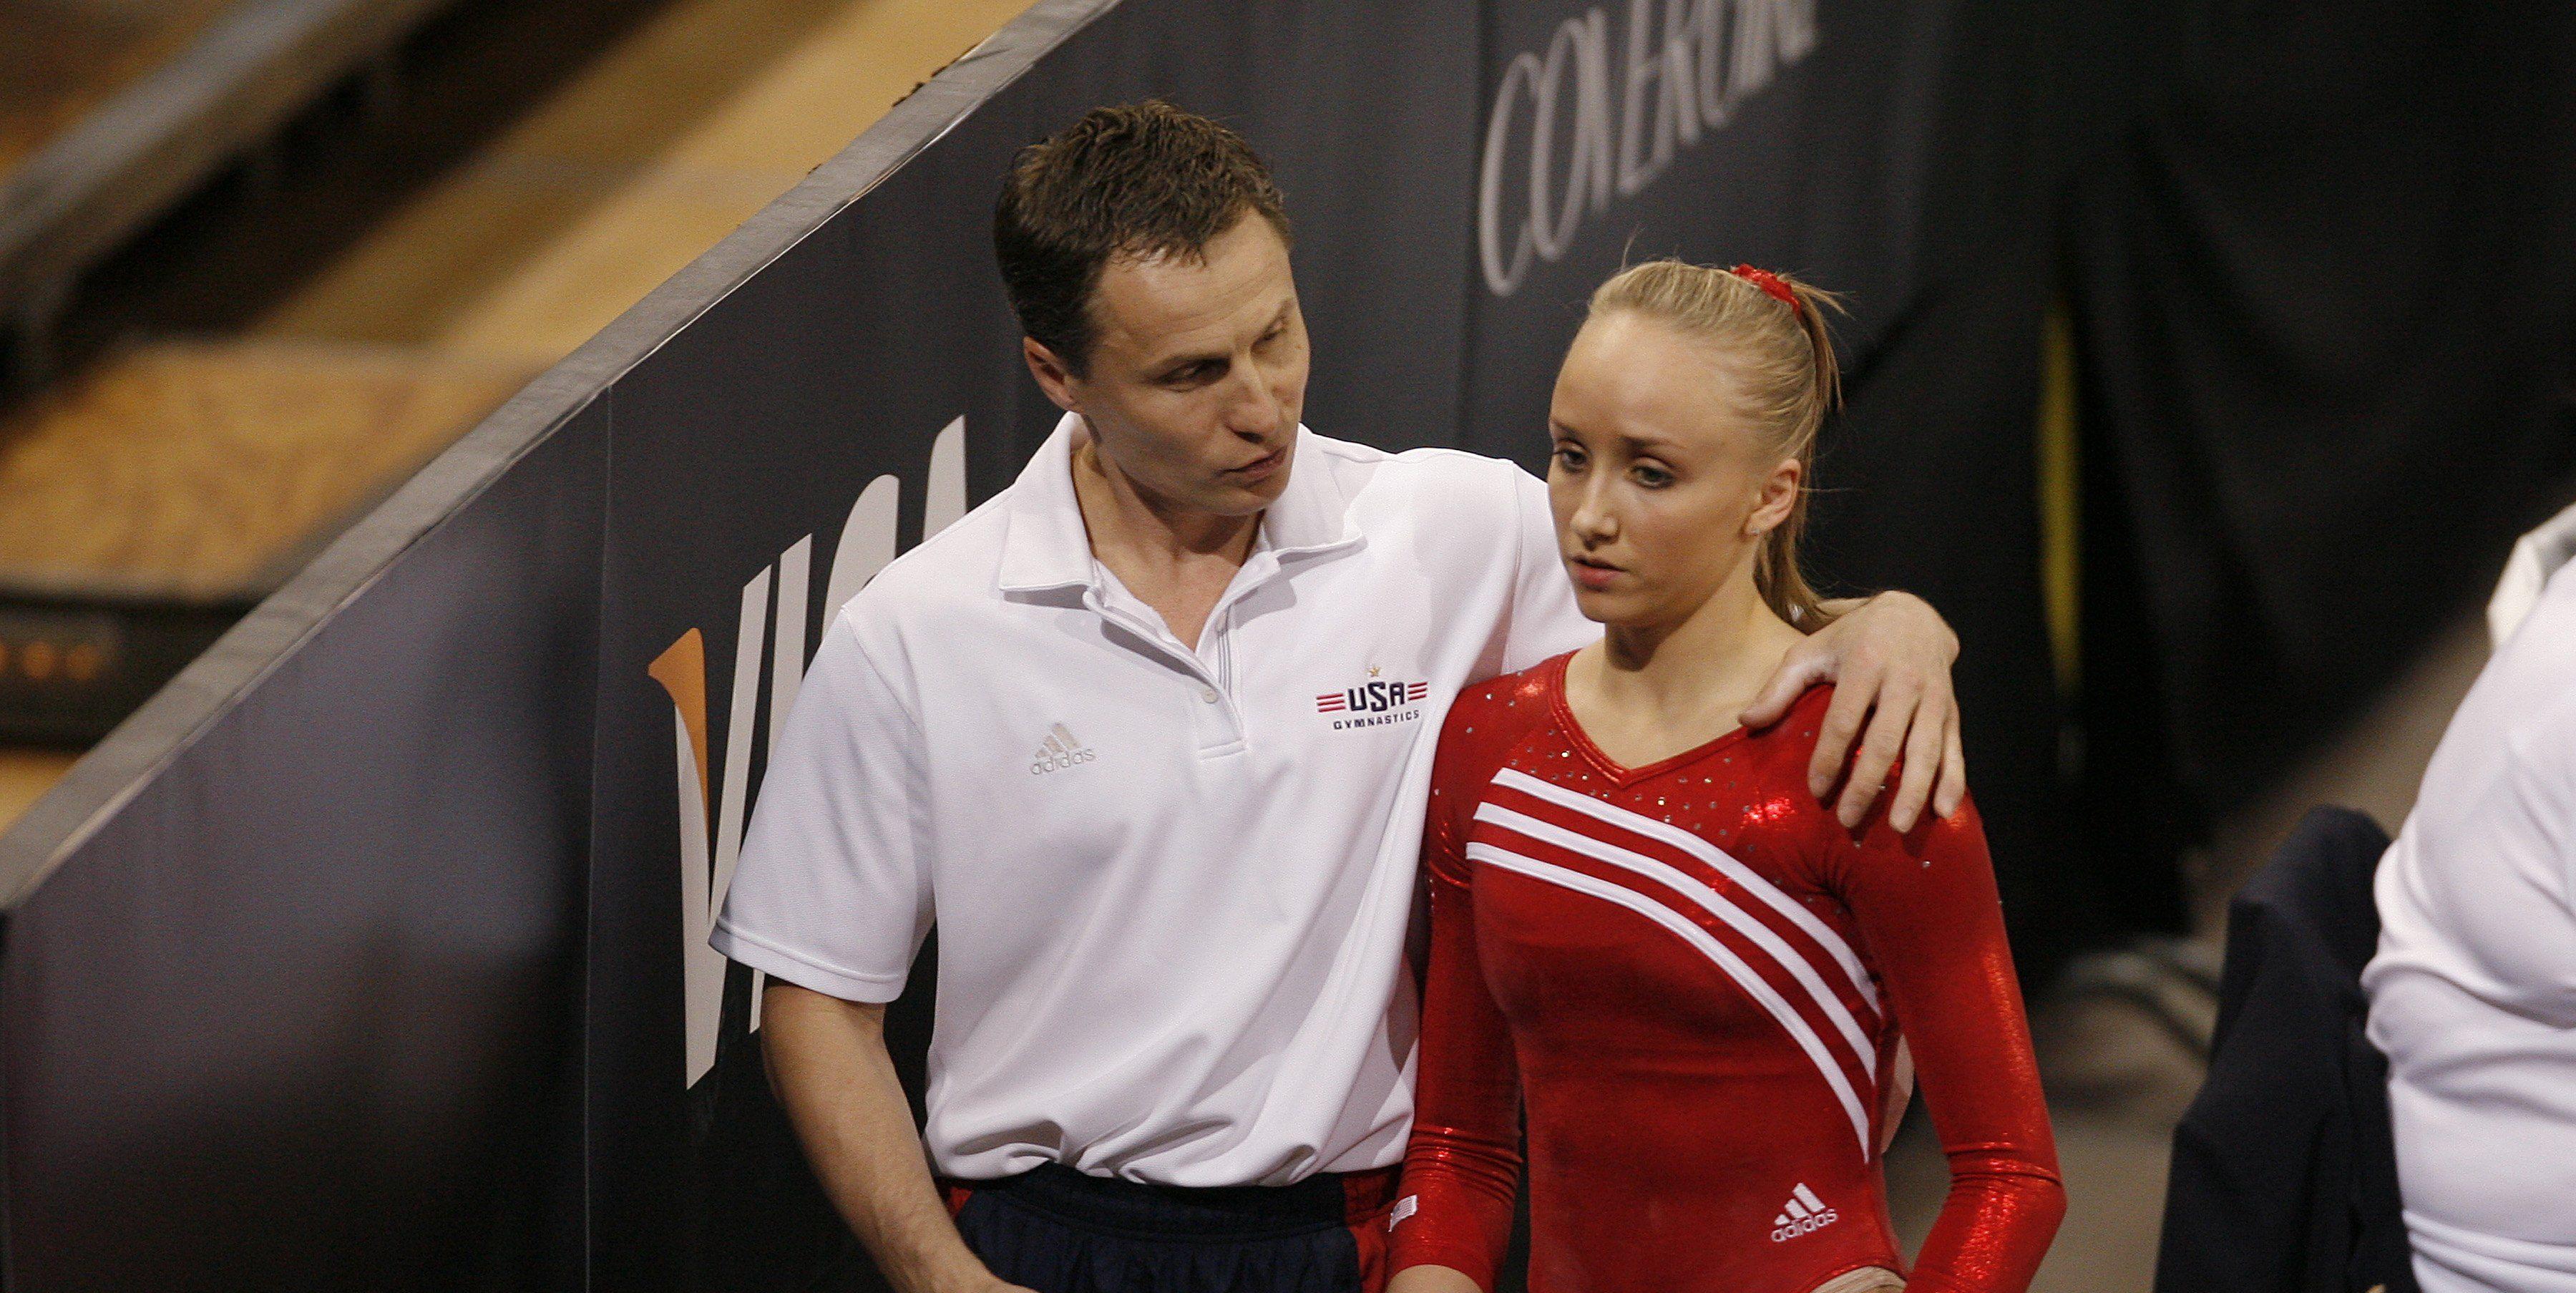 Nastia Liukin's Father Has Just Been Named USA Gymnastics' New Women's Coach